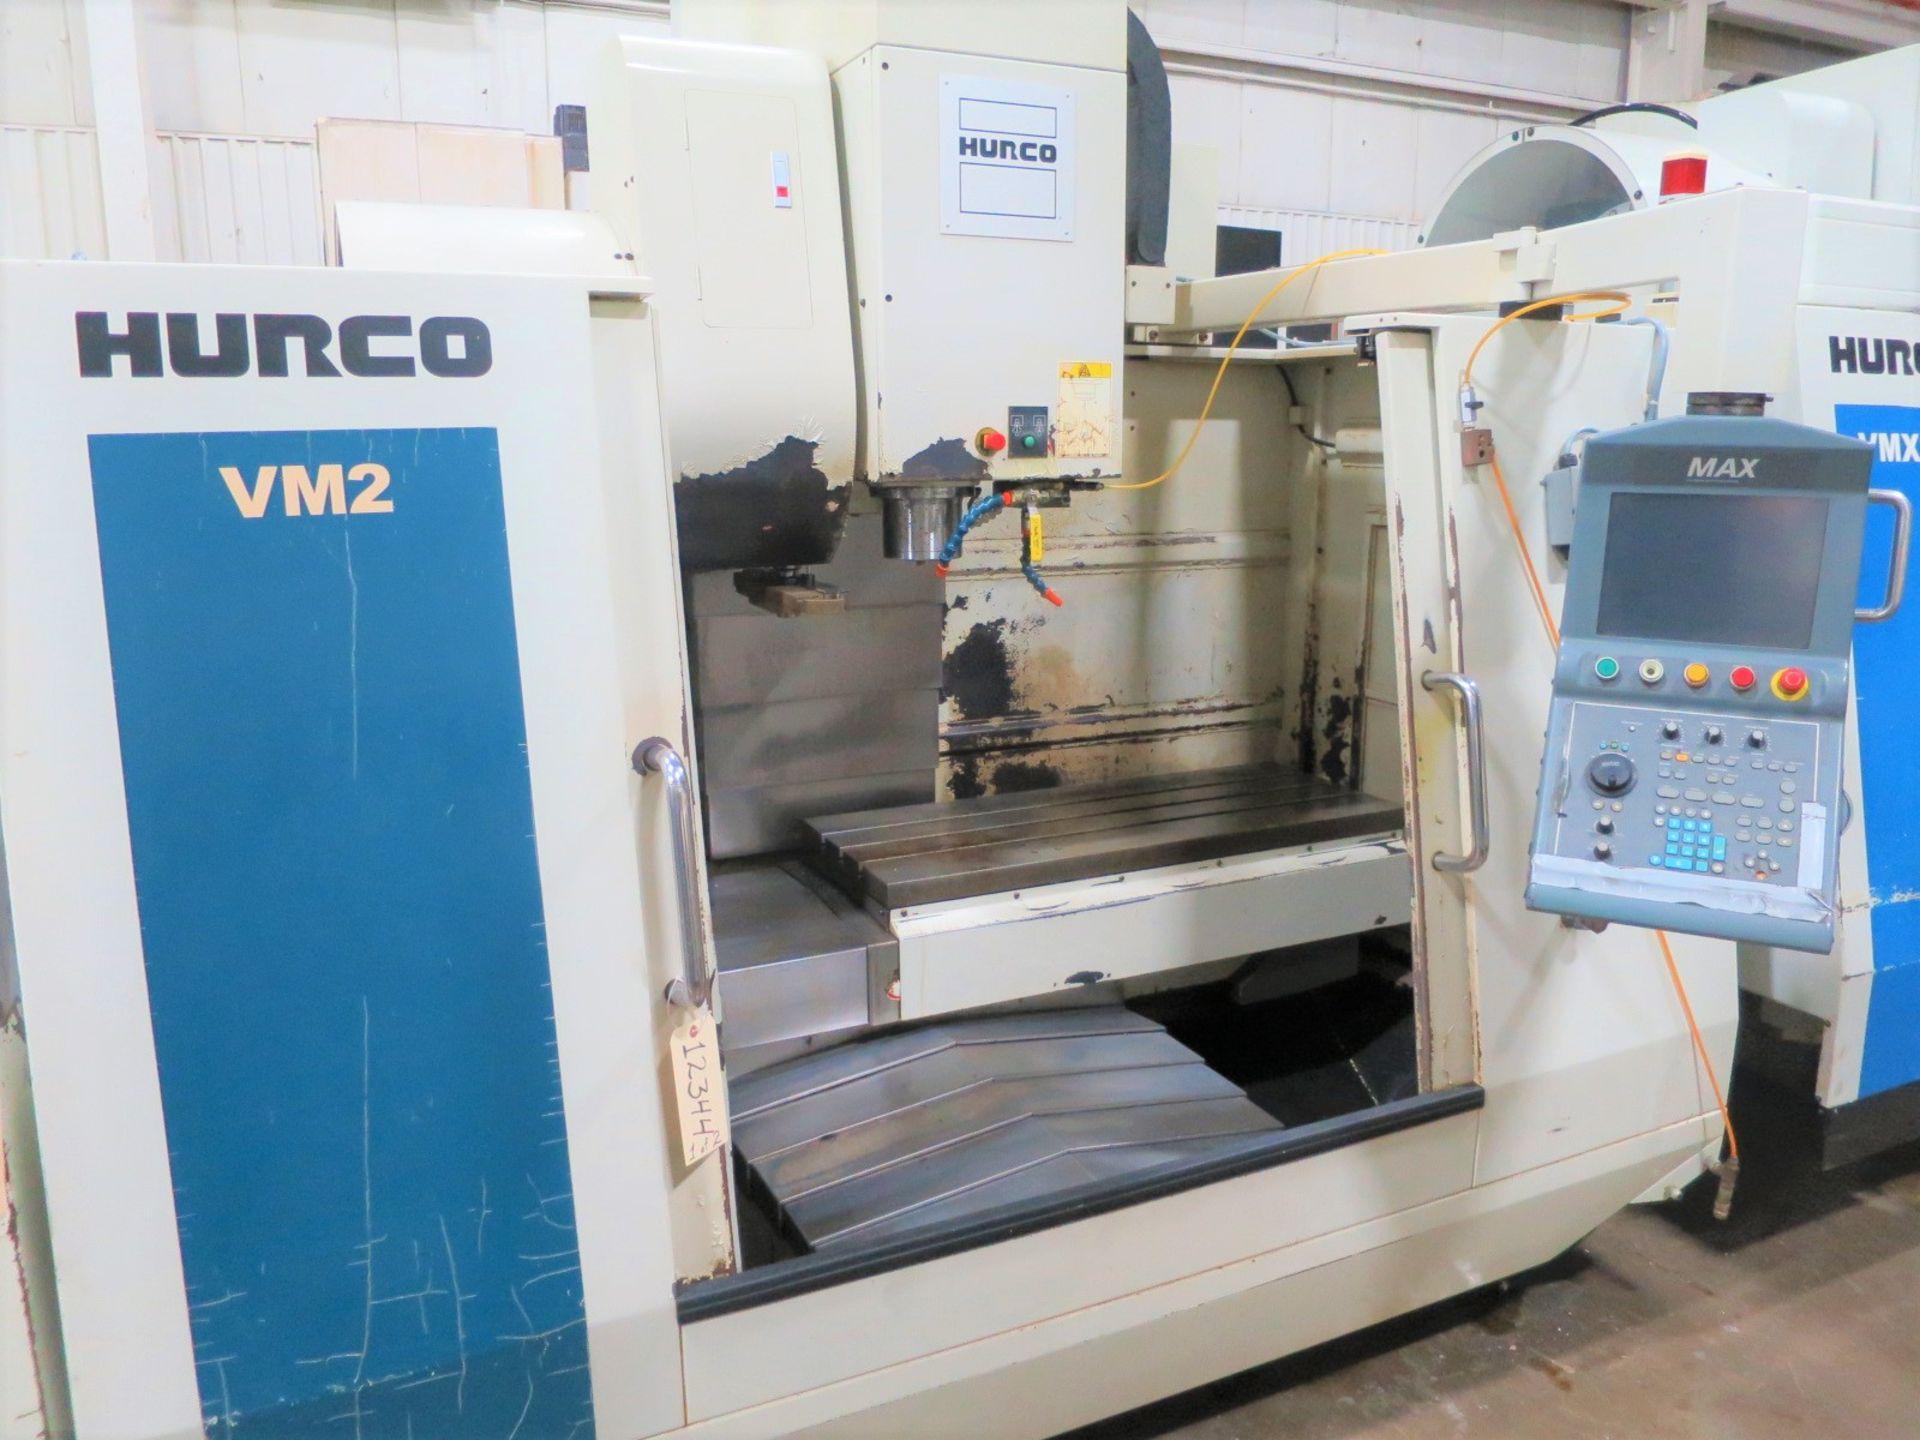 Lot 53 - Hurco VM2 3-Axis CNC Vertical Machining Center, S/N M2-06008103AEA, New 2003